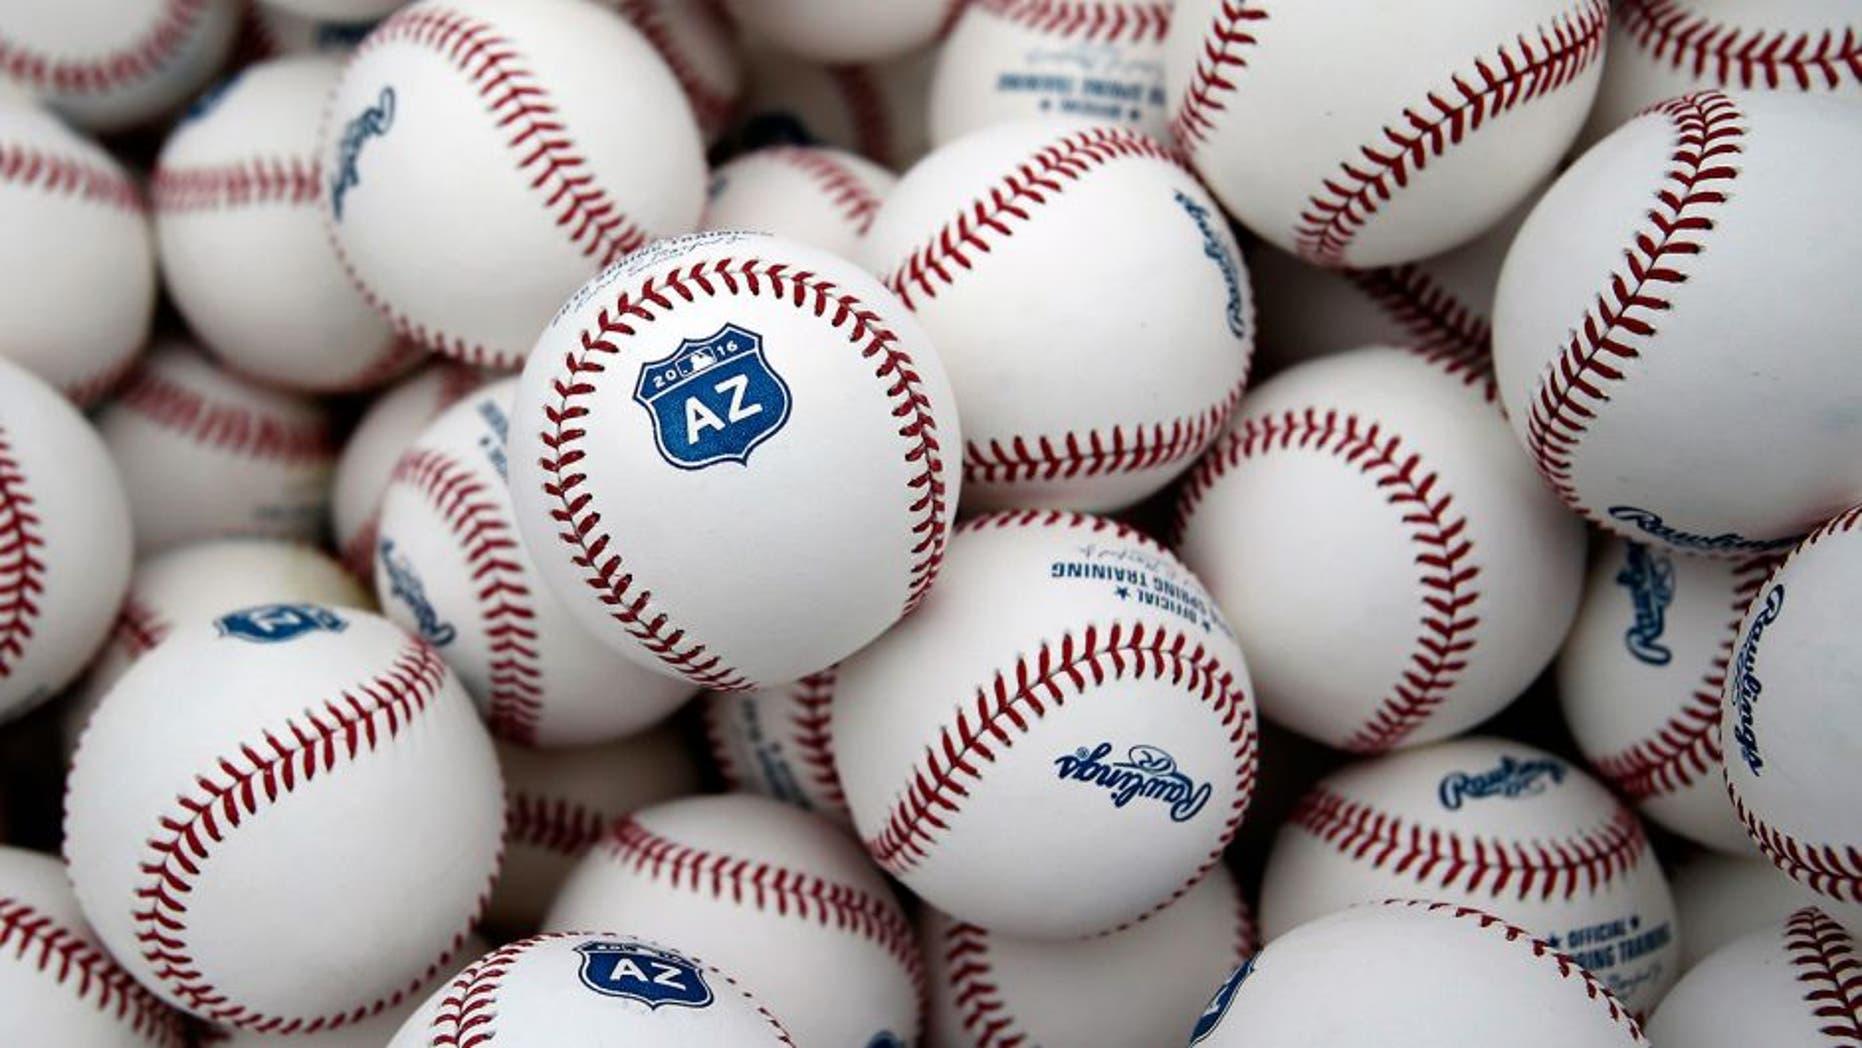 Feb 19, 2016; Scottsdale, AZ, USA; MLB baseball show the new logo at Arizona Diamondbacks spring training camp at Salt River Fields. Mandatory Credit: Rick Scuteri-USA TODAY Sports